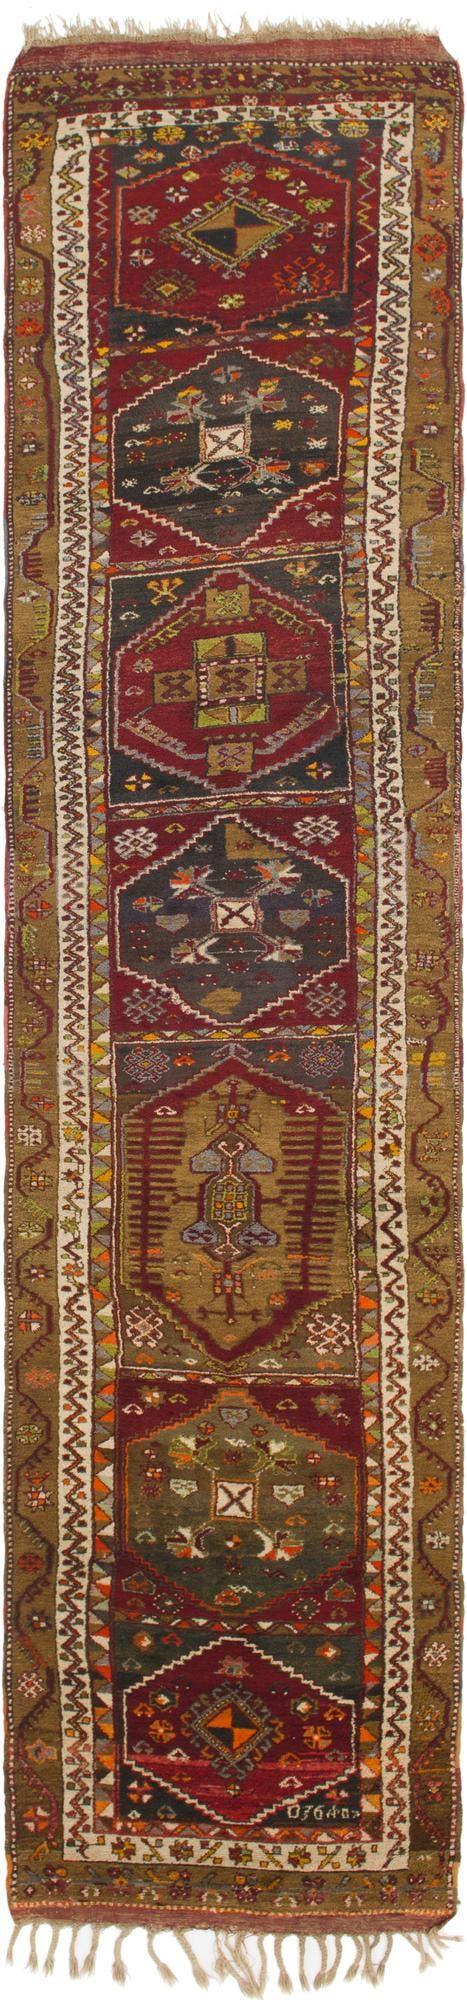 3' 7 x 16' 2 Anatolian Oriental Runner Rug main image